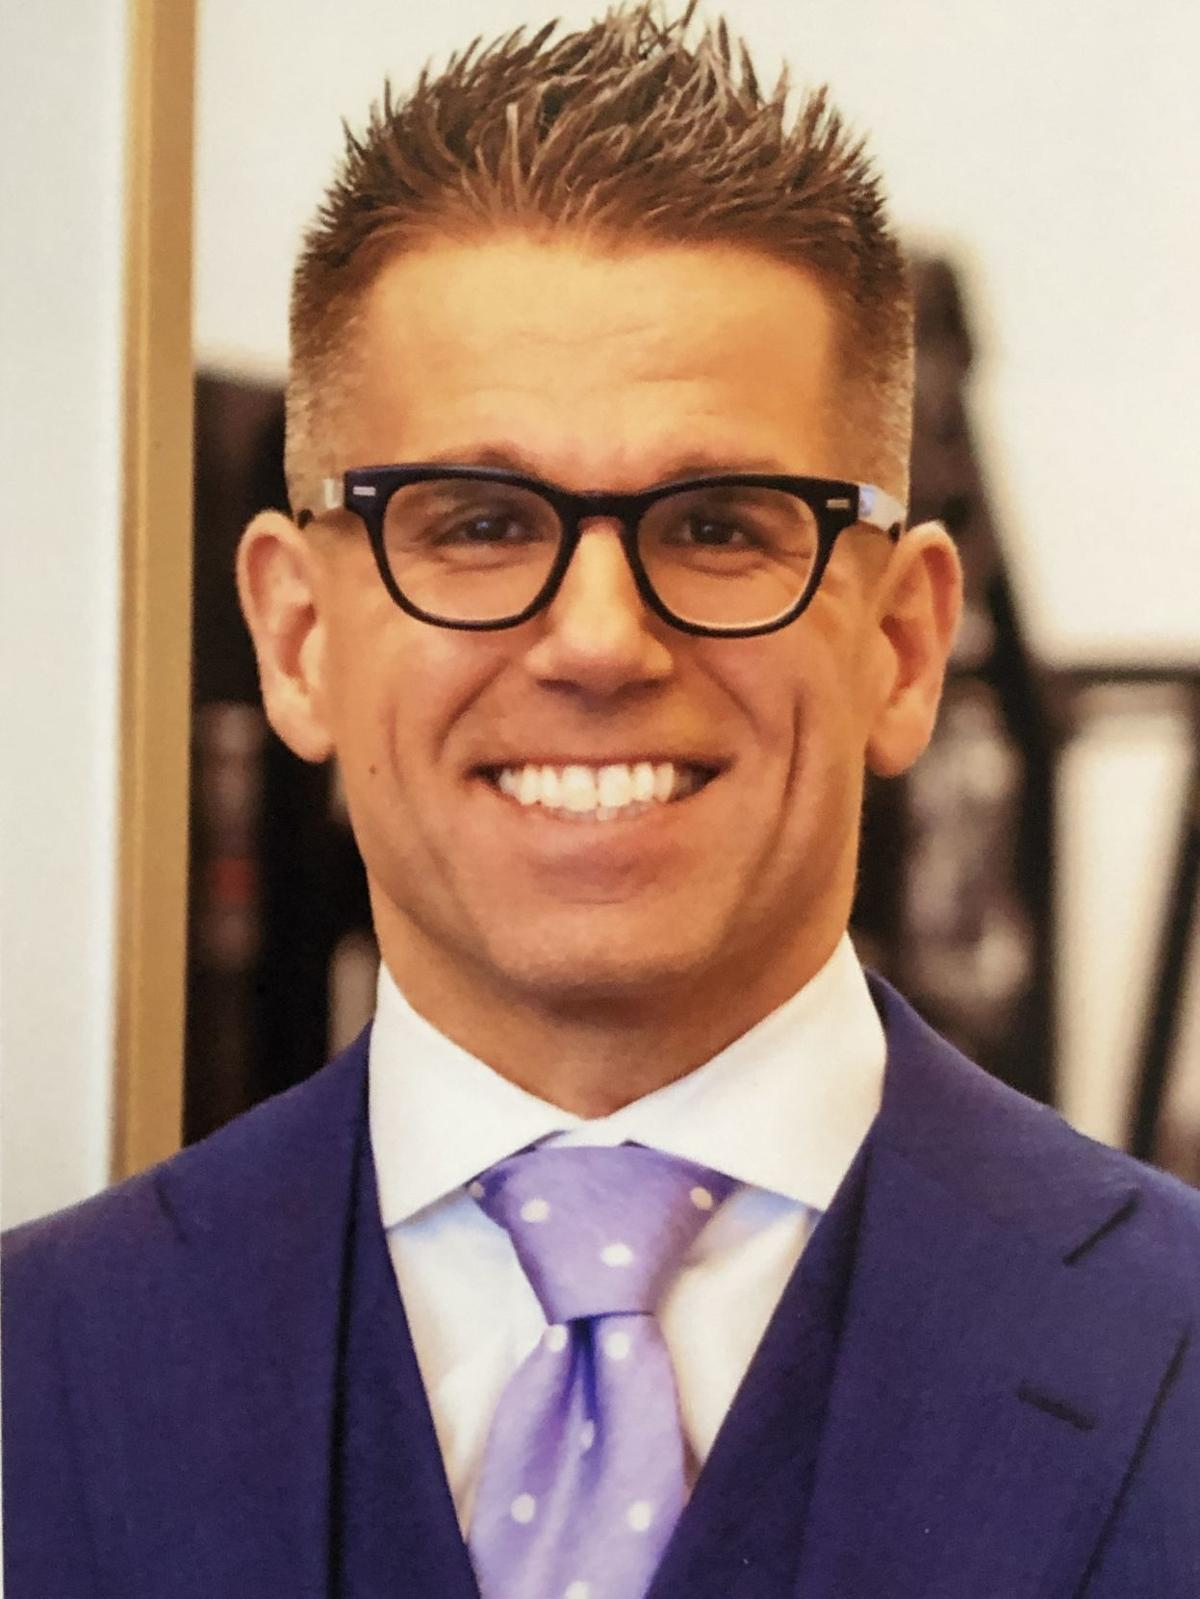 Luke Carlson